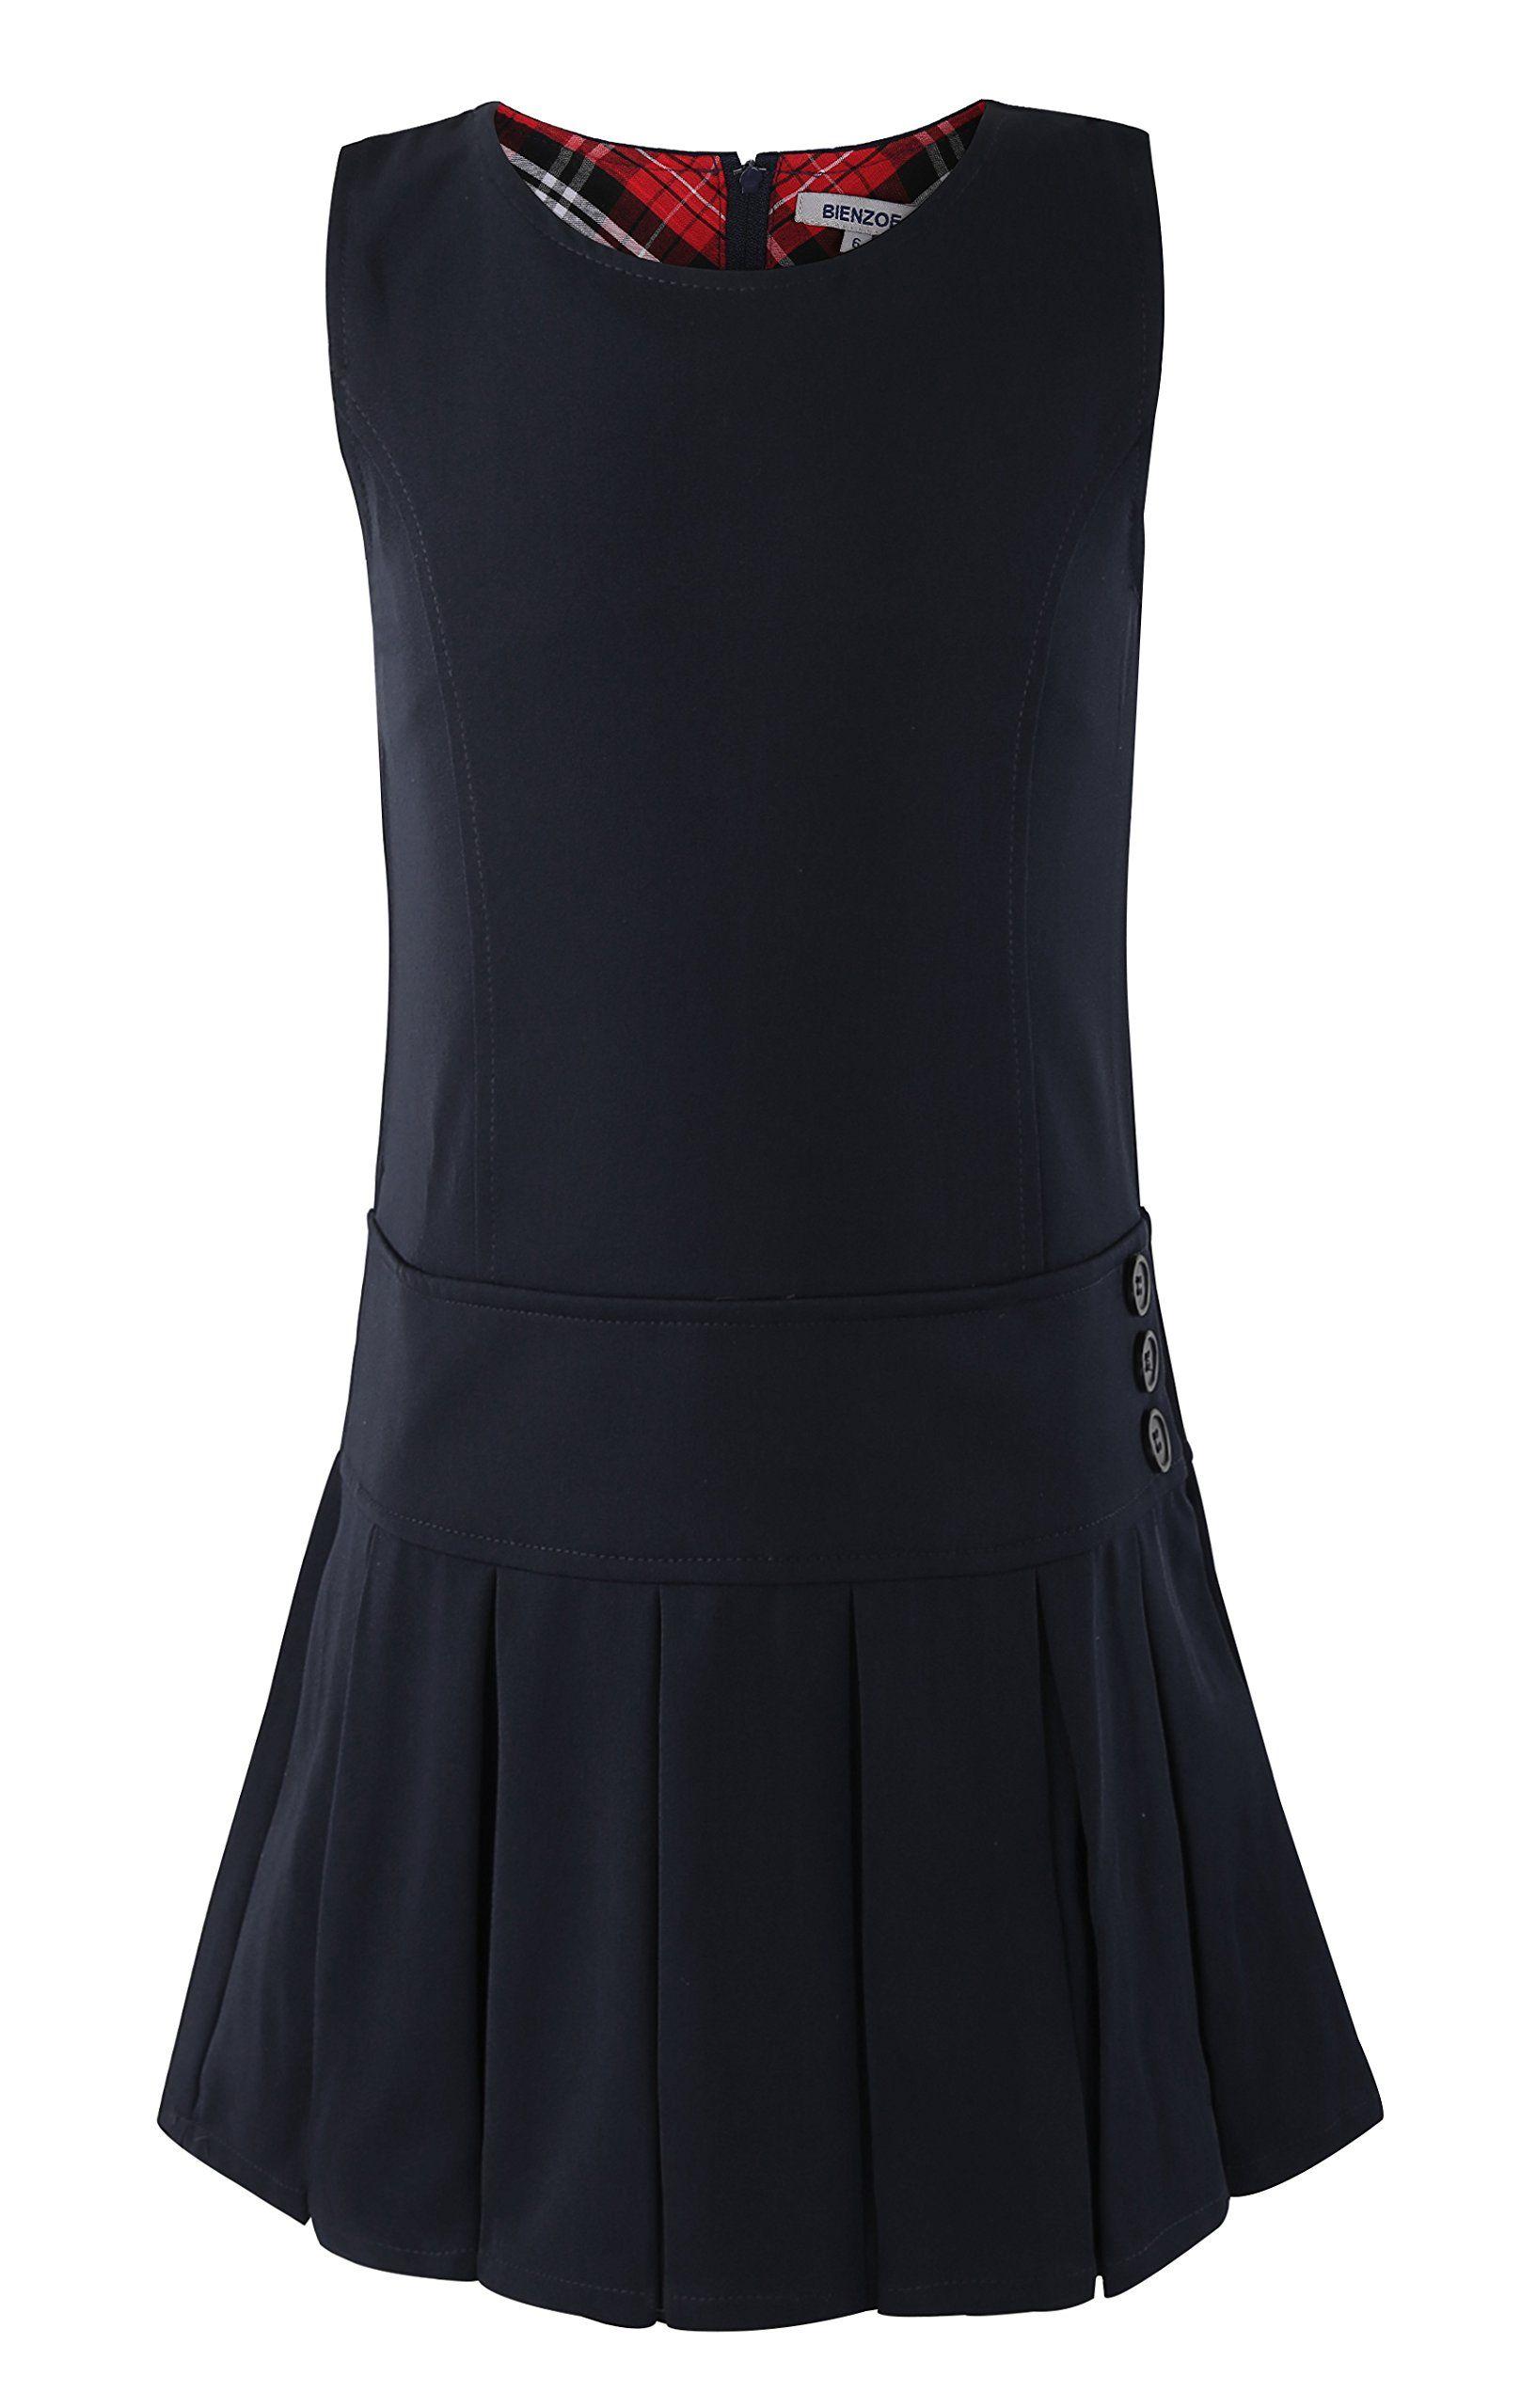 Bienzoe Girls School Uniform Pleated Jumper Dress